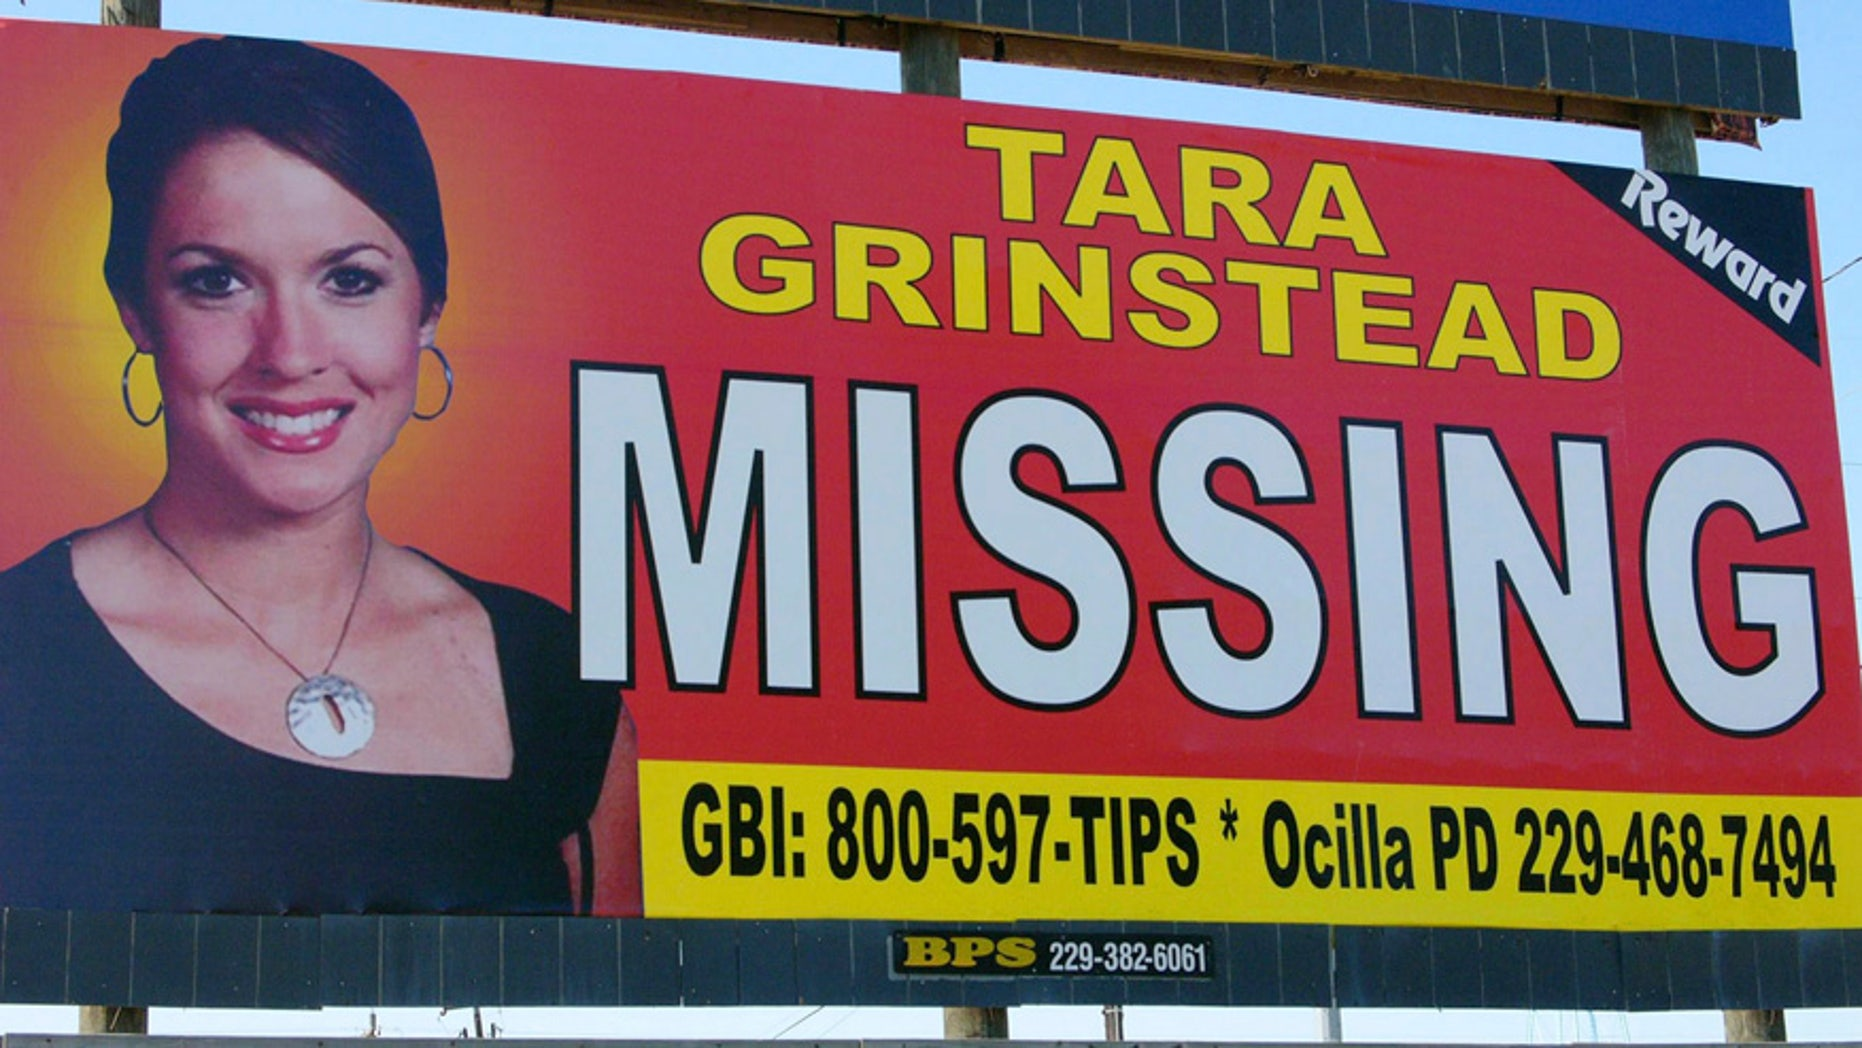 A photo of missing teacher Tara Grinstead displayed on a billboard in Ocilla in 2006.